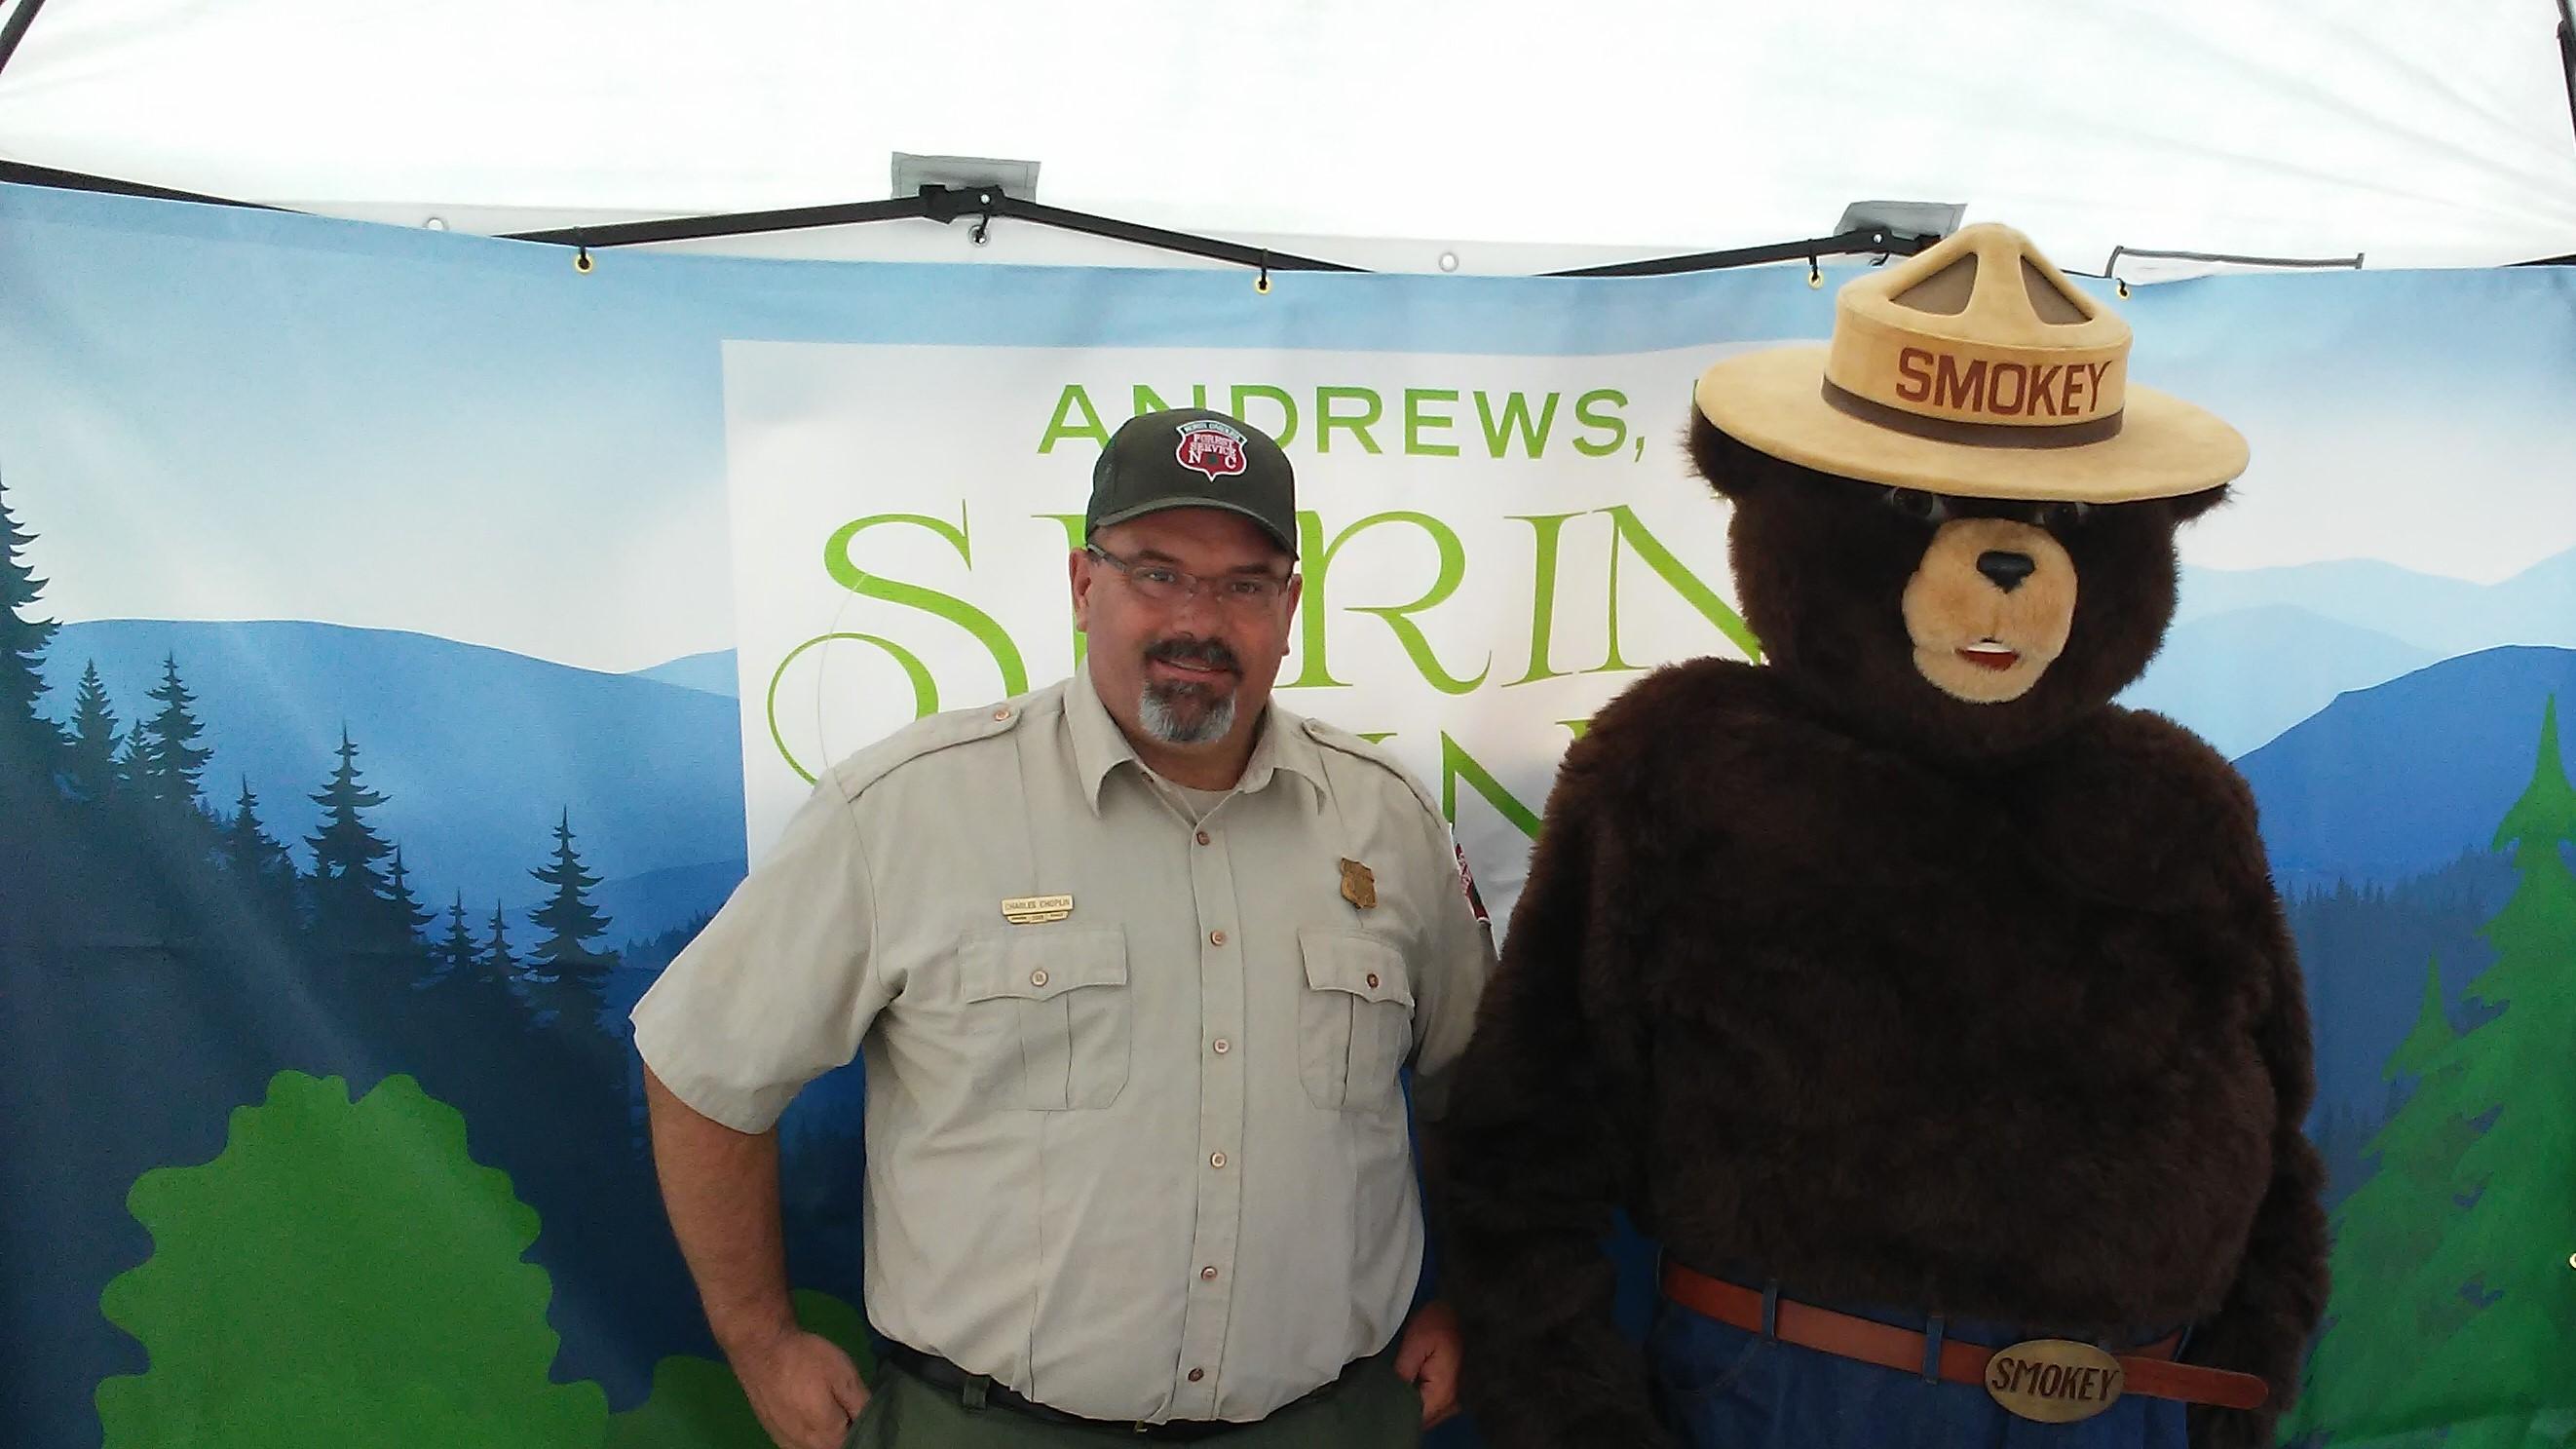 Andrews NC Spring Fling Andrews NC 2018 - 2019